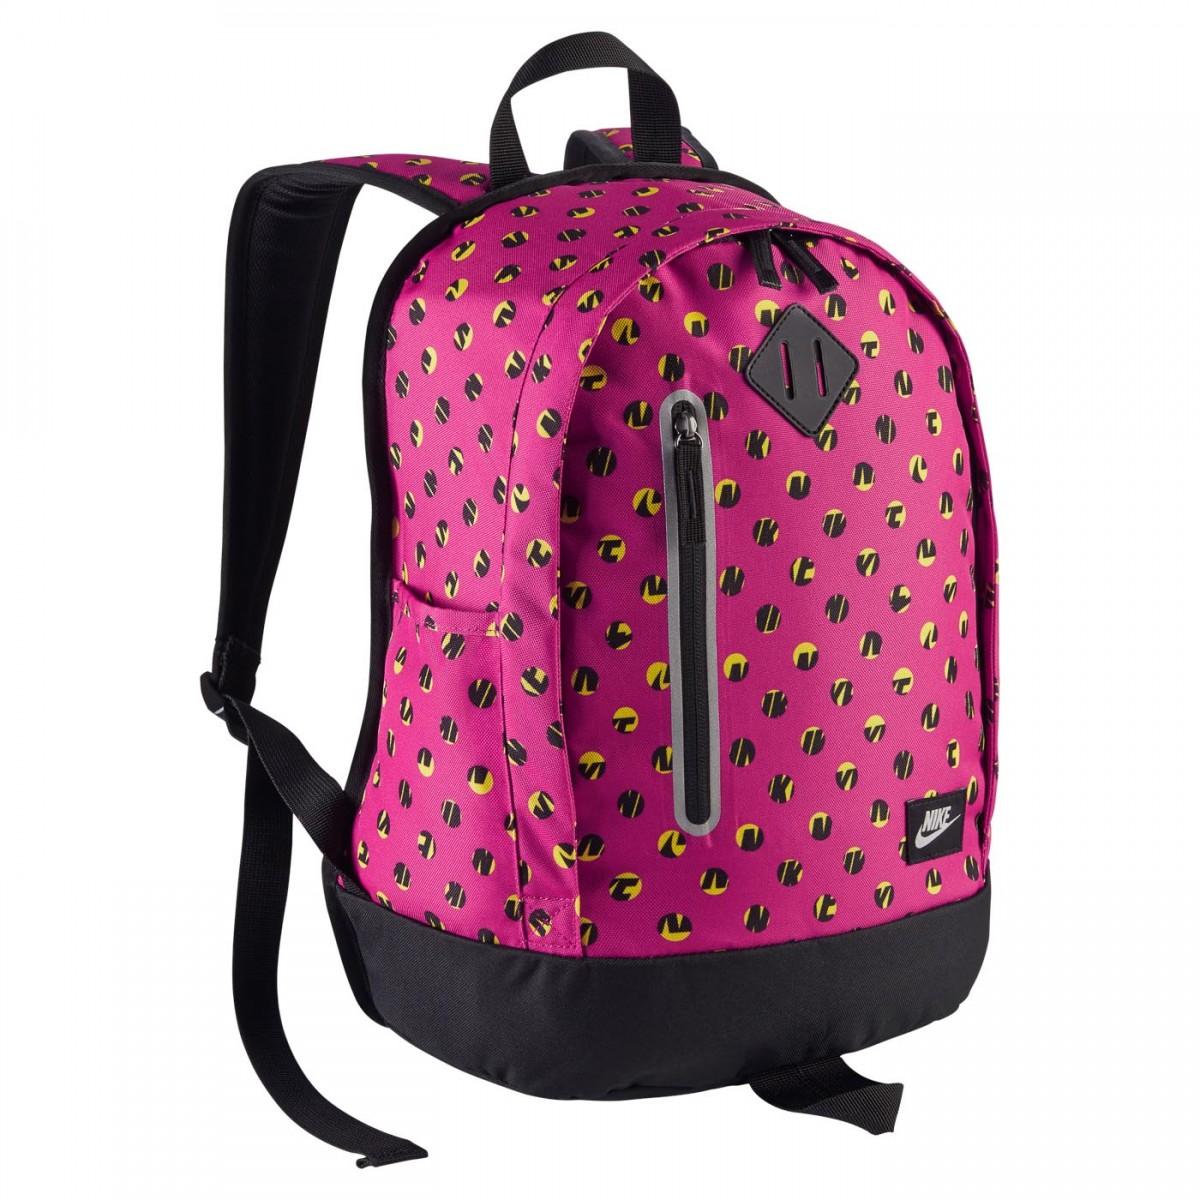 930312f27 Bizz Store - Mochila Escolar Feminina Nike Cheyenne Print